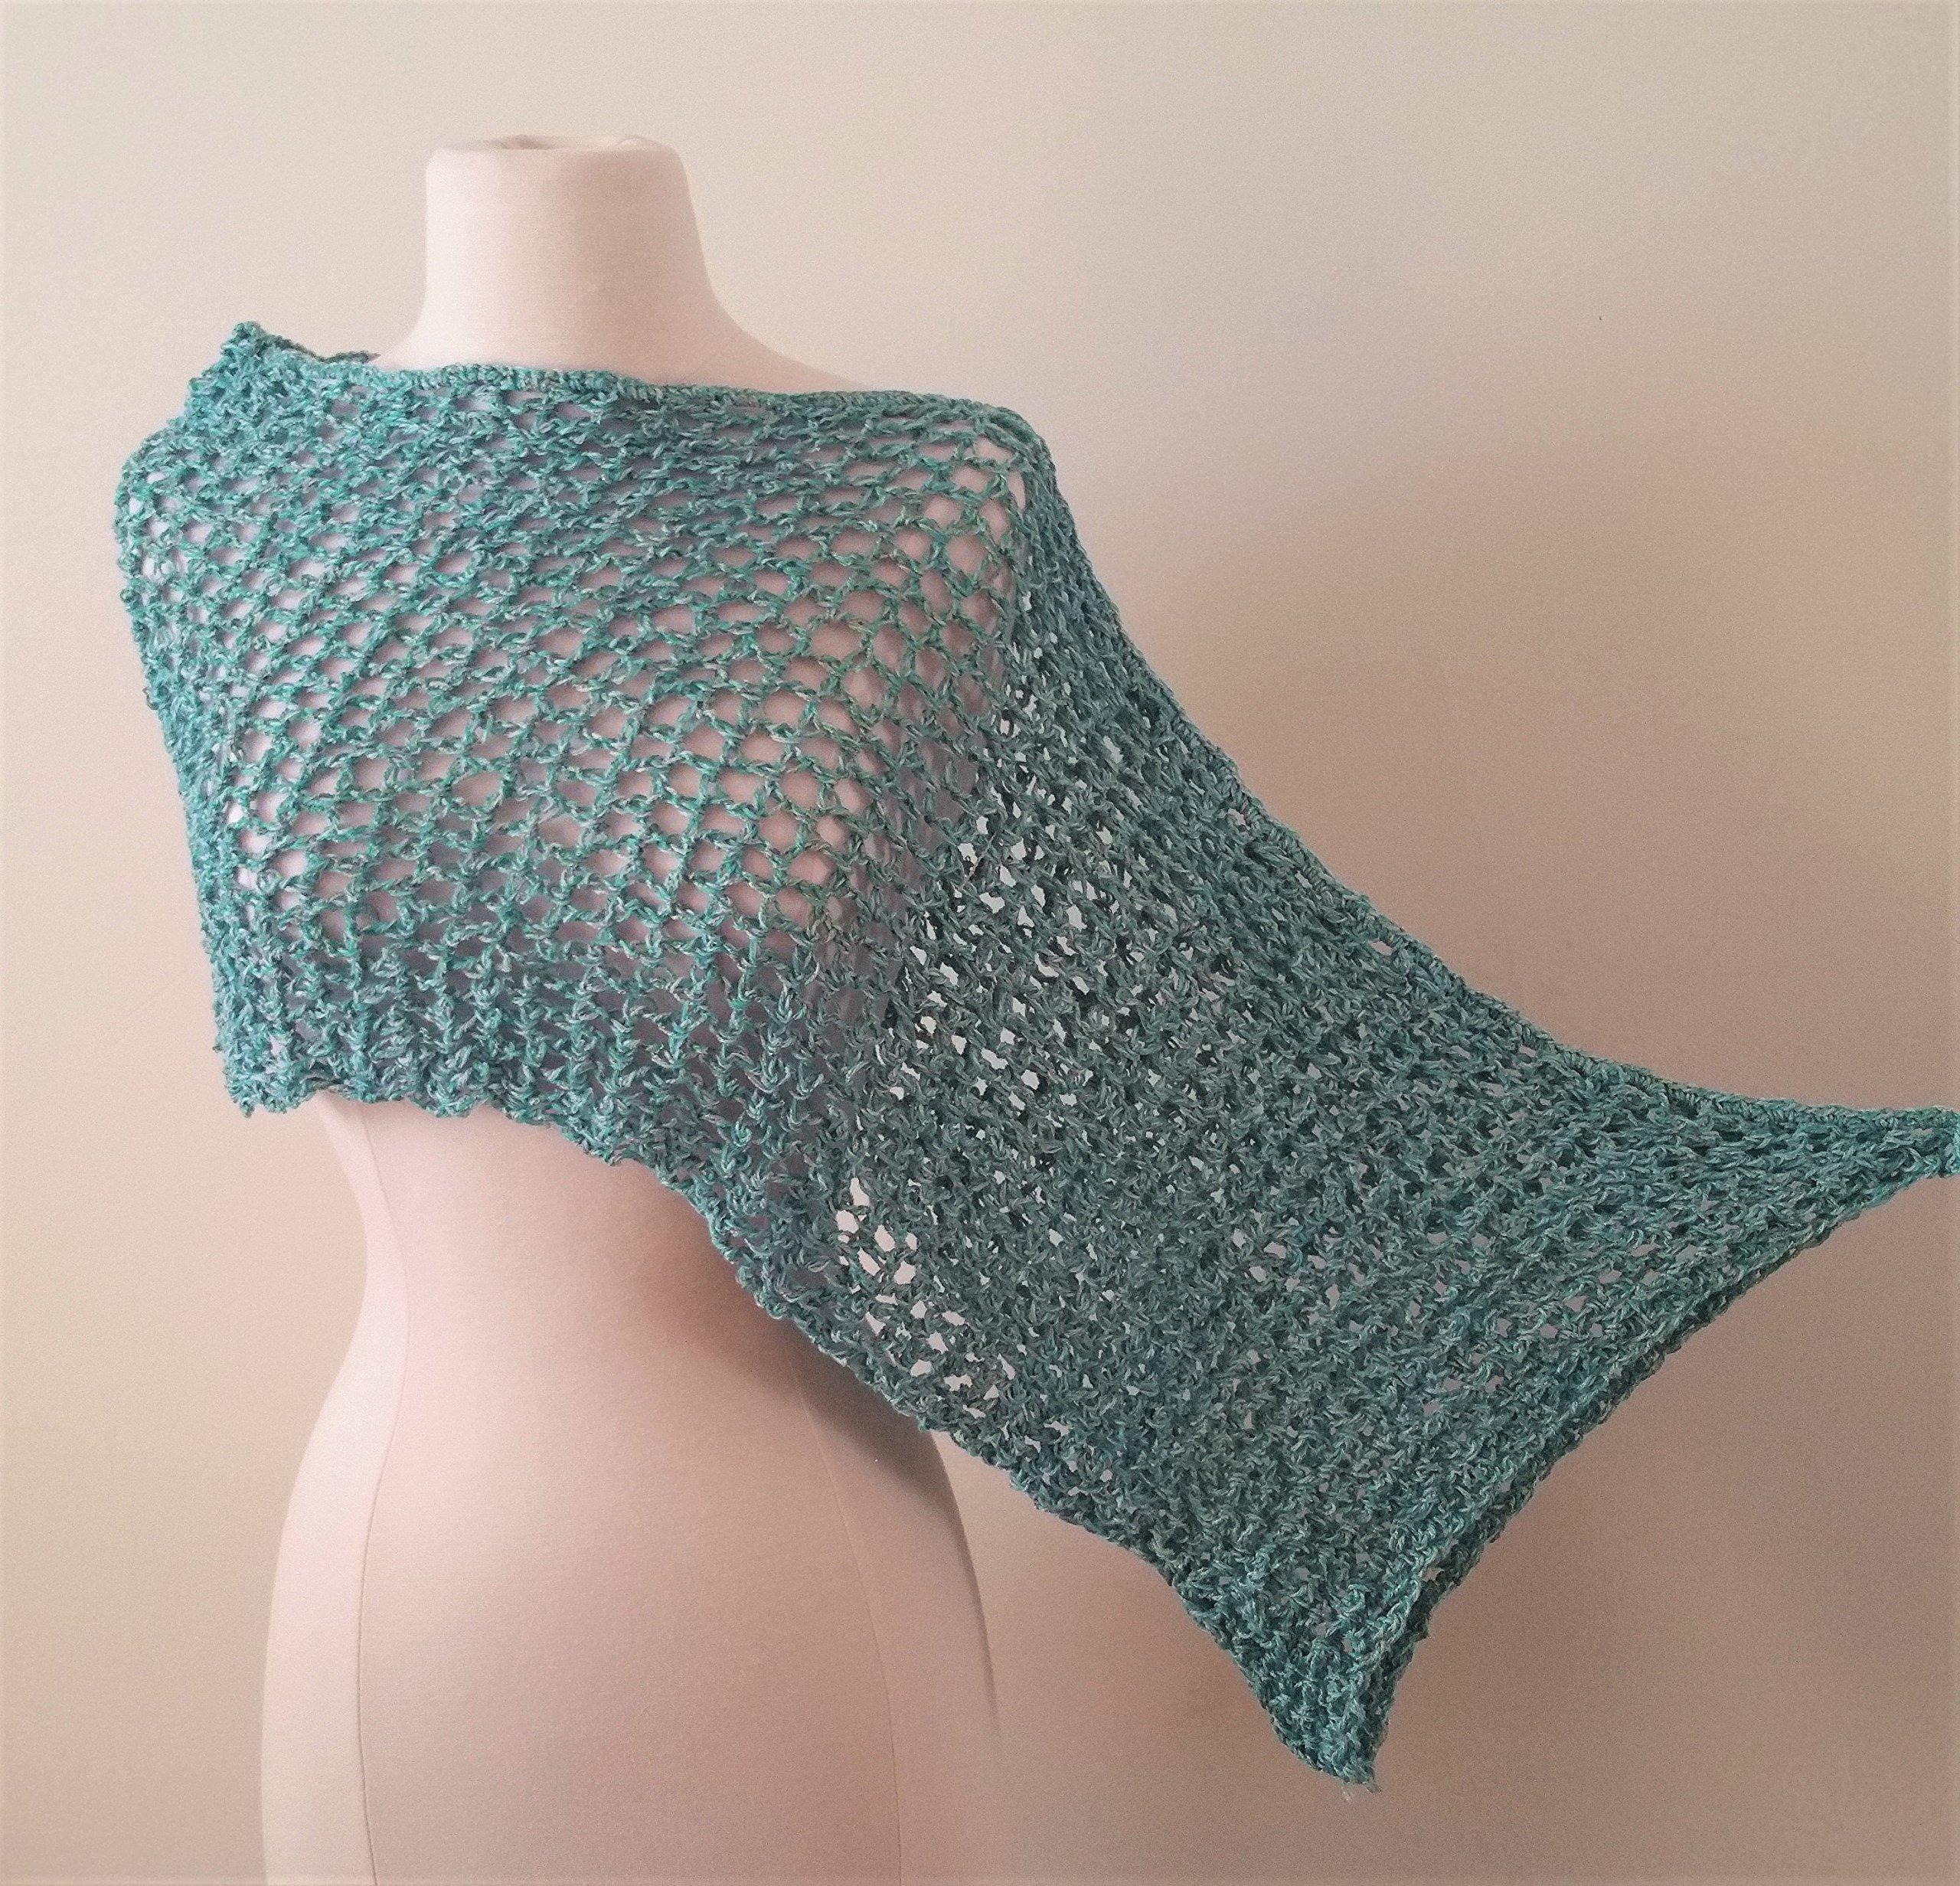 Crochet Asymmetrical Poncho - light turquoise